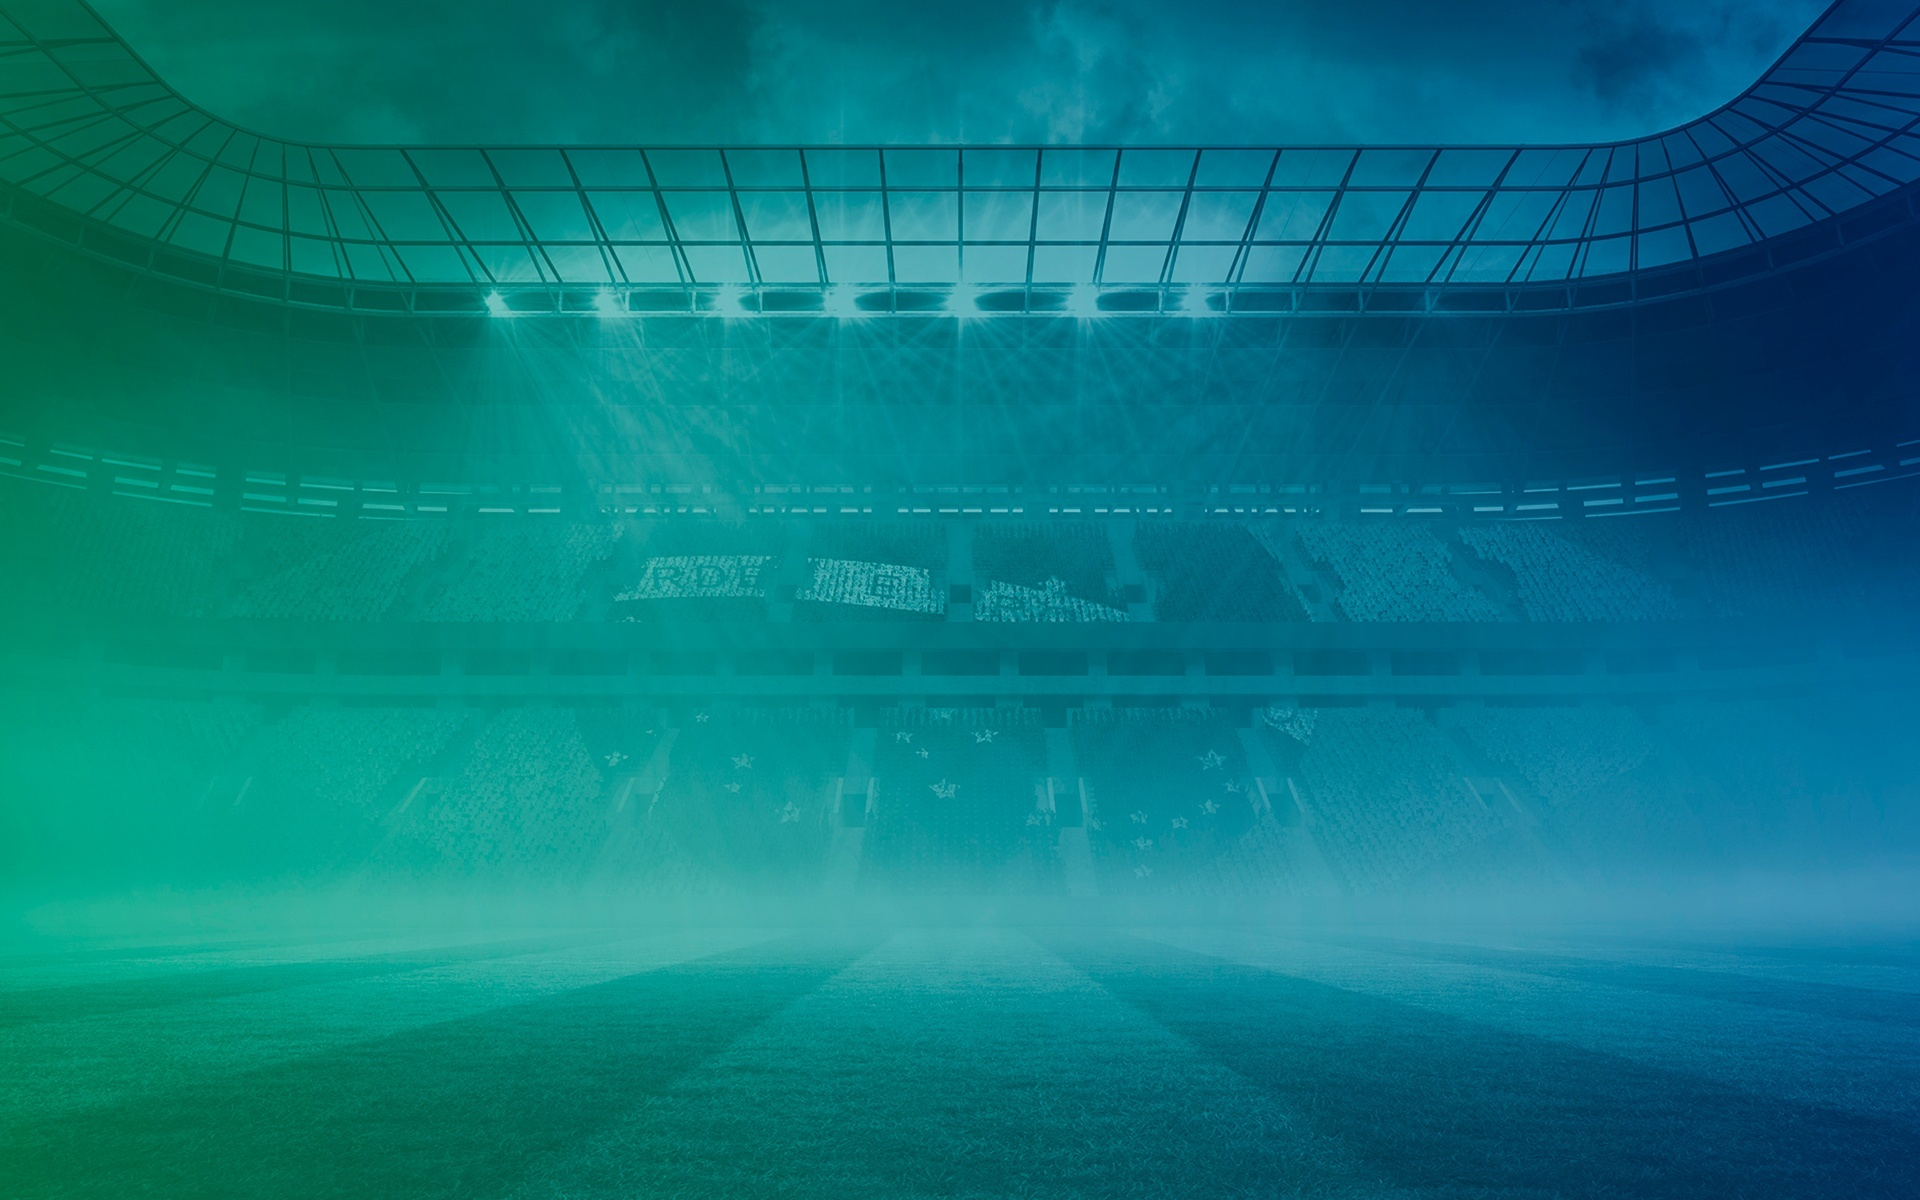 Afiliago Fondo Campo de Fútbol